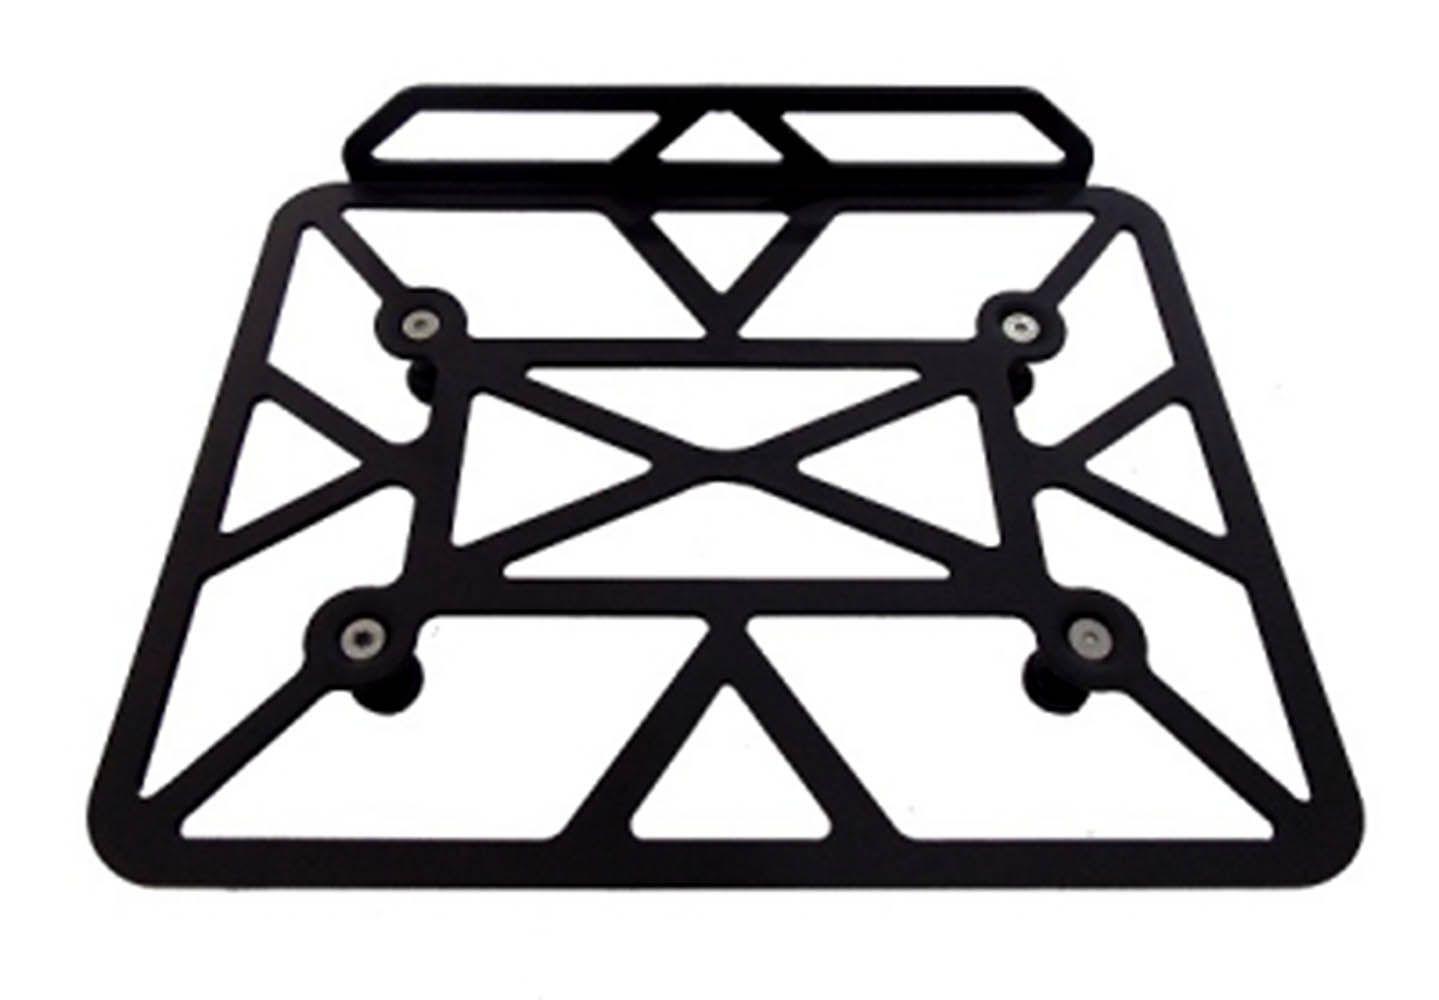 Grelha Bau Rack Superior Bau Grande Universal Chapa 10637